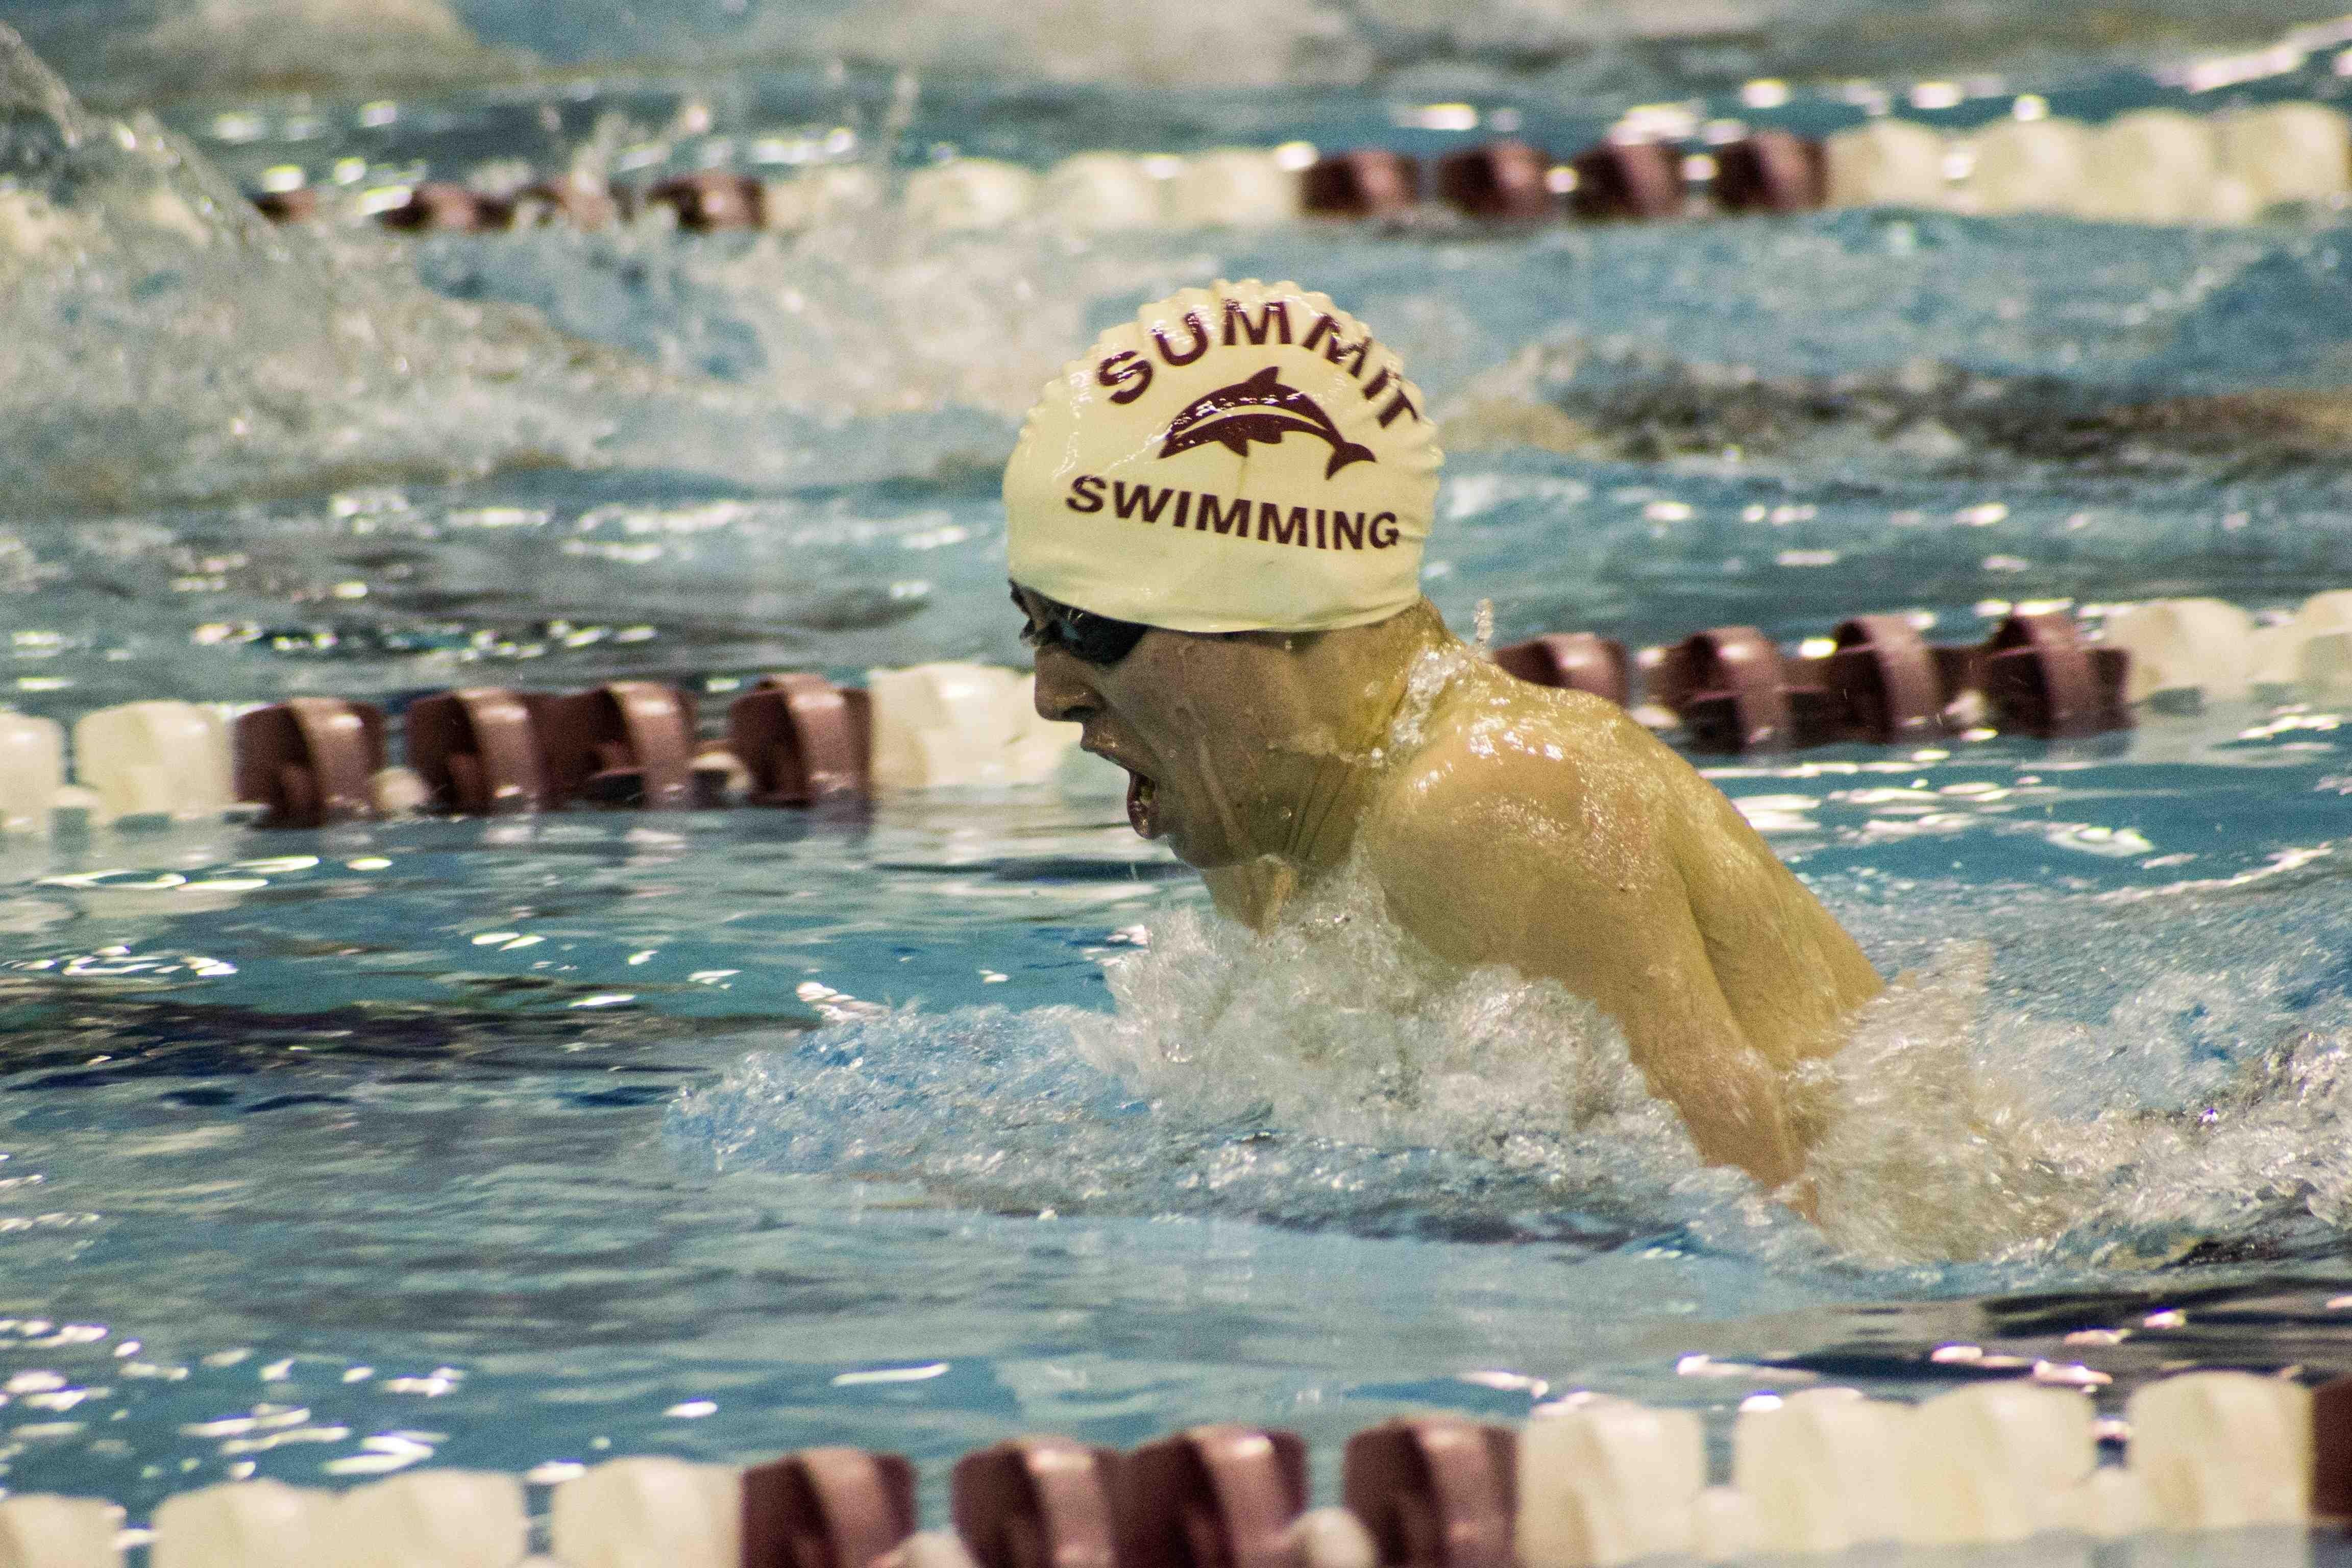 fae4100f8343c14b7015_Summit_Swimming_Cap.jpg